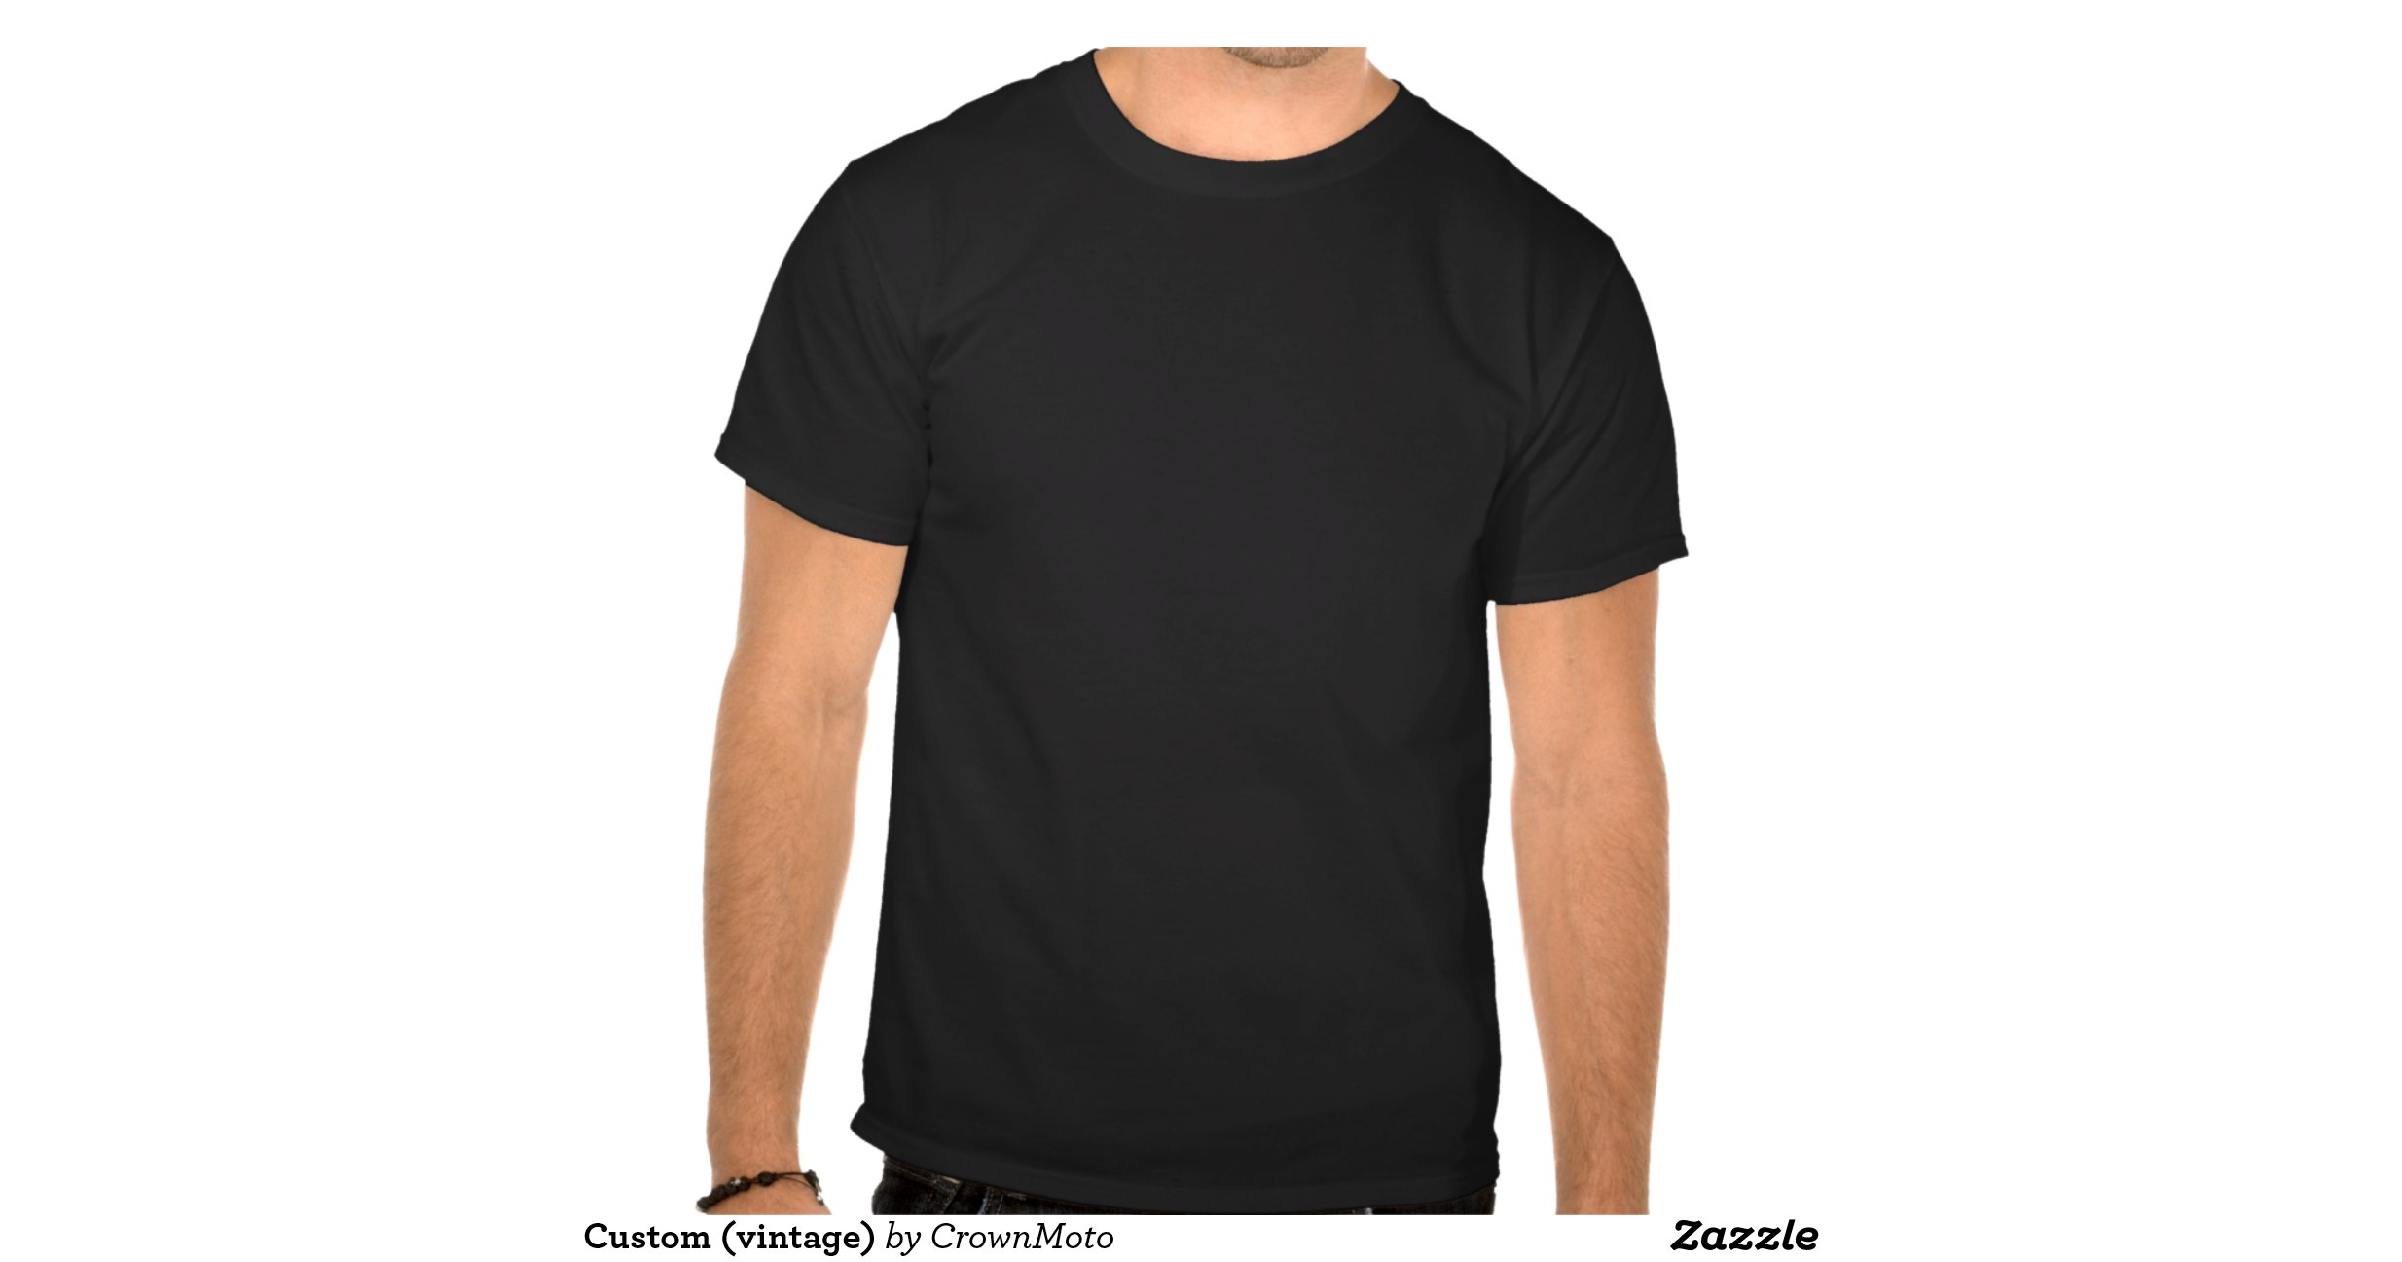 Custom vintage t shirt zazzle for Zazzle custom t shirts